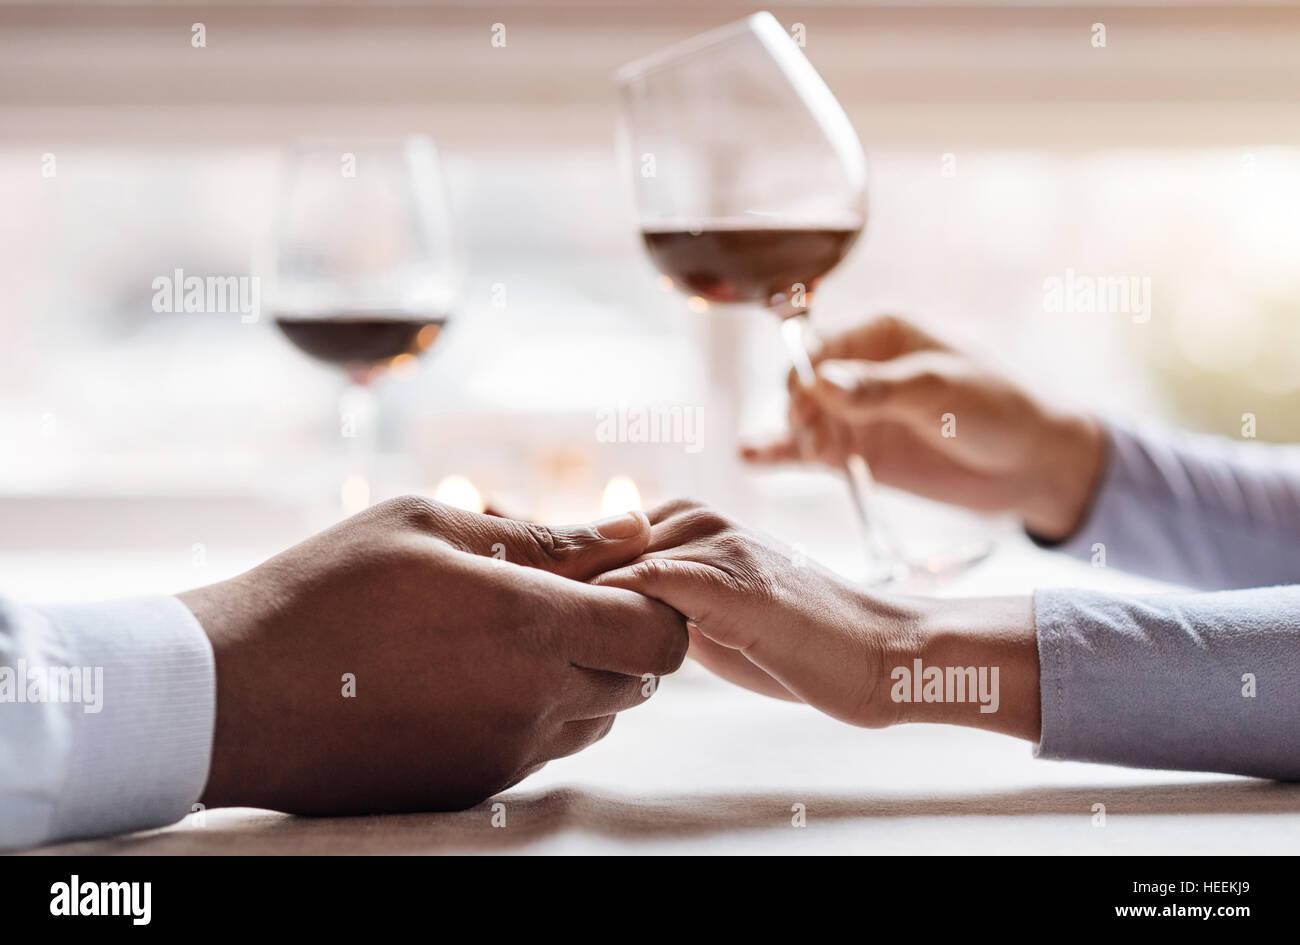 Positiven afroamerikanischen Paar genießt das Getränk im restaurant Stockbild